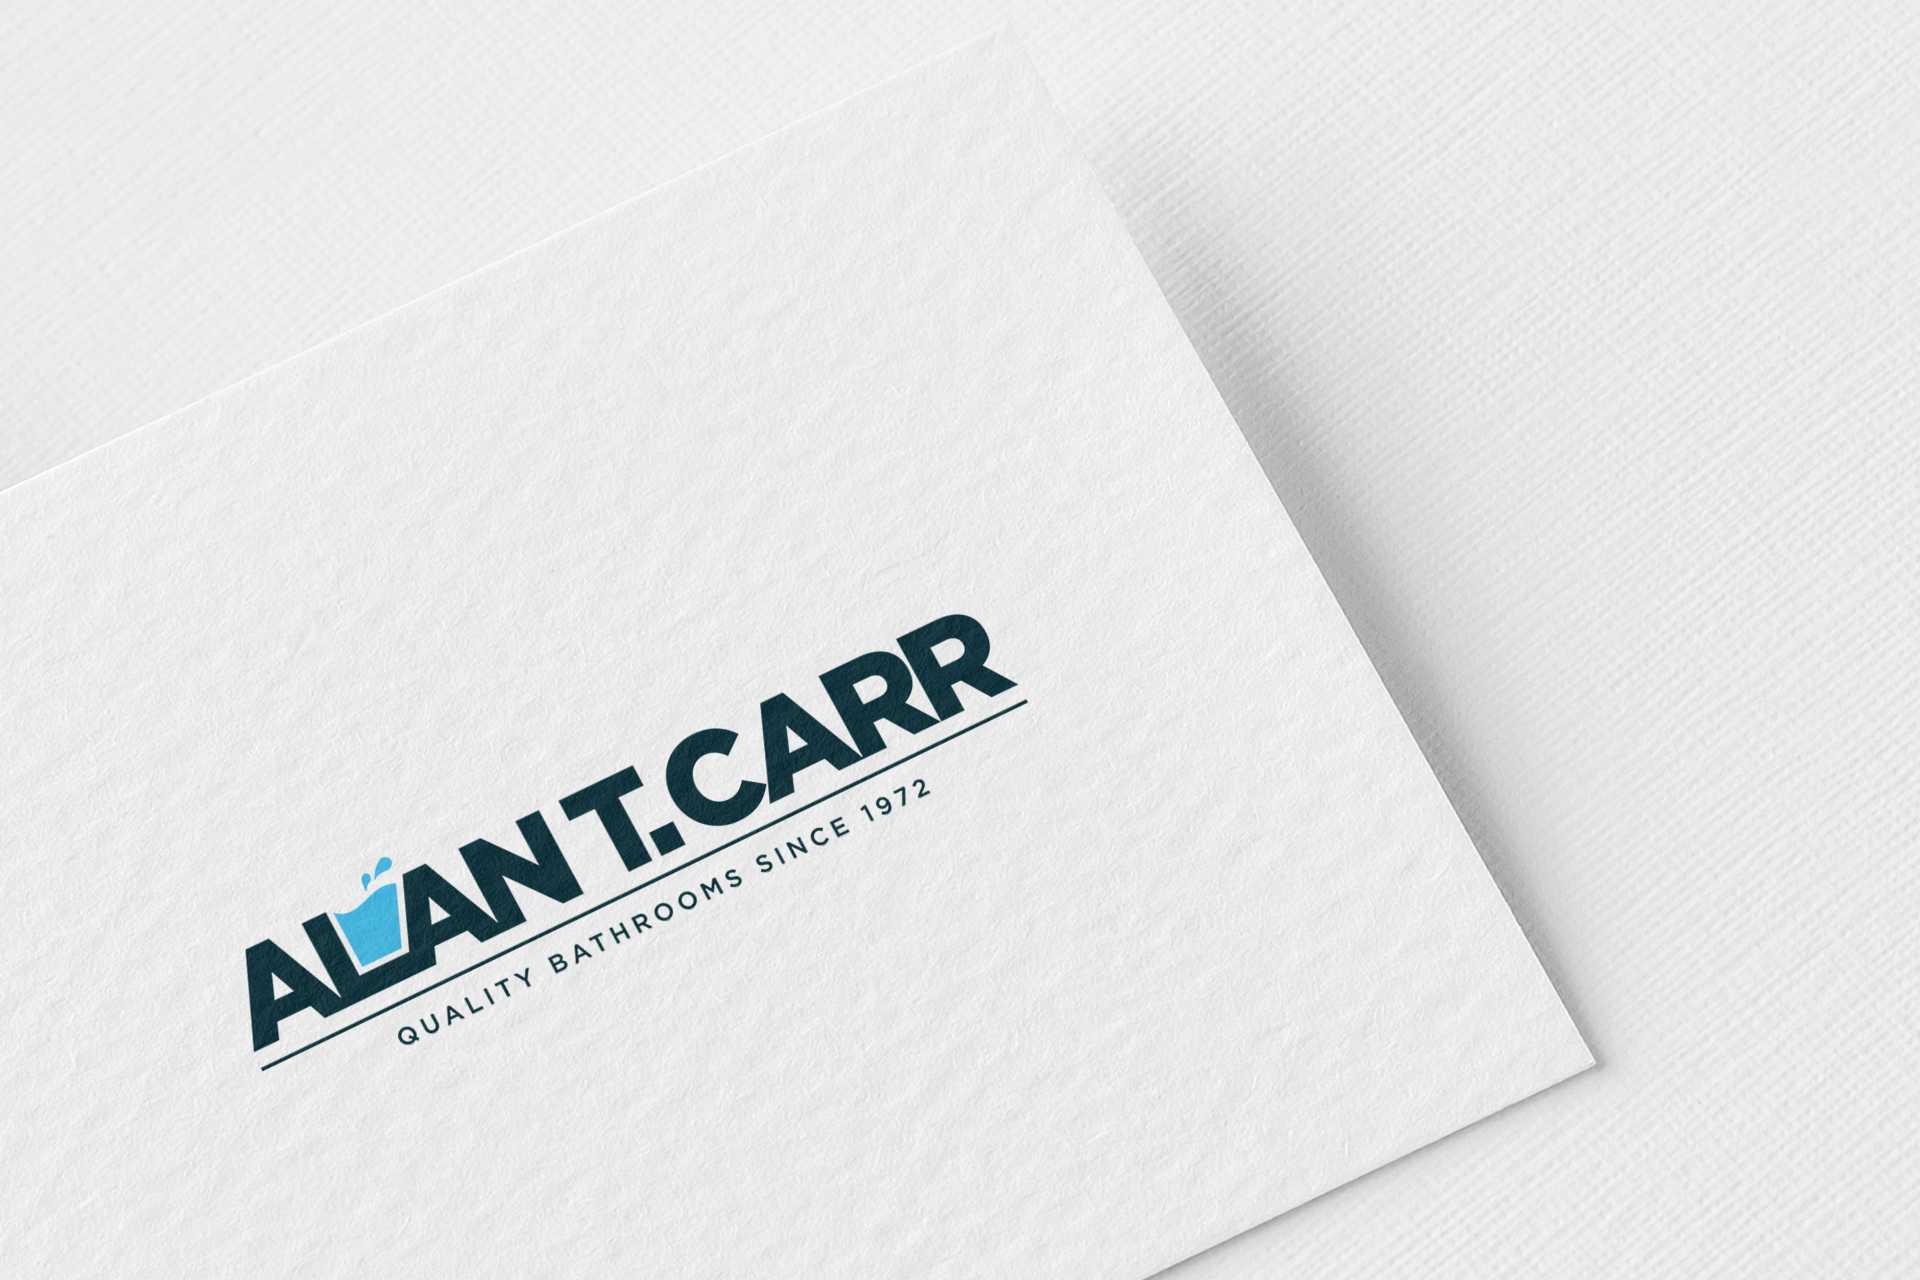 pixel-perfect-warrington-alan-t-carr-logo-design